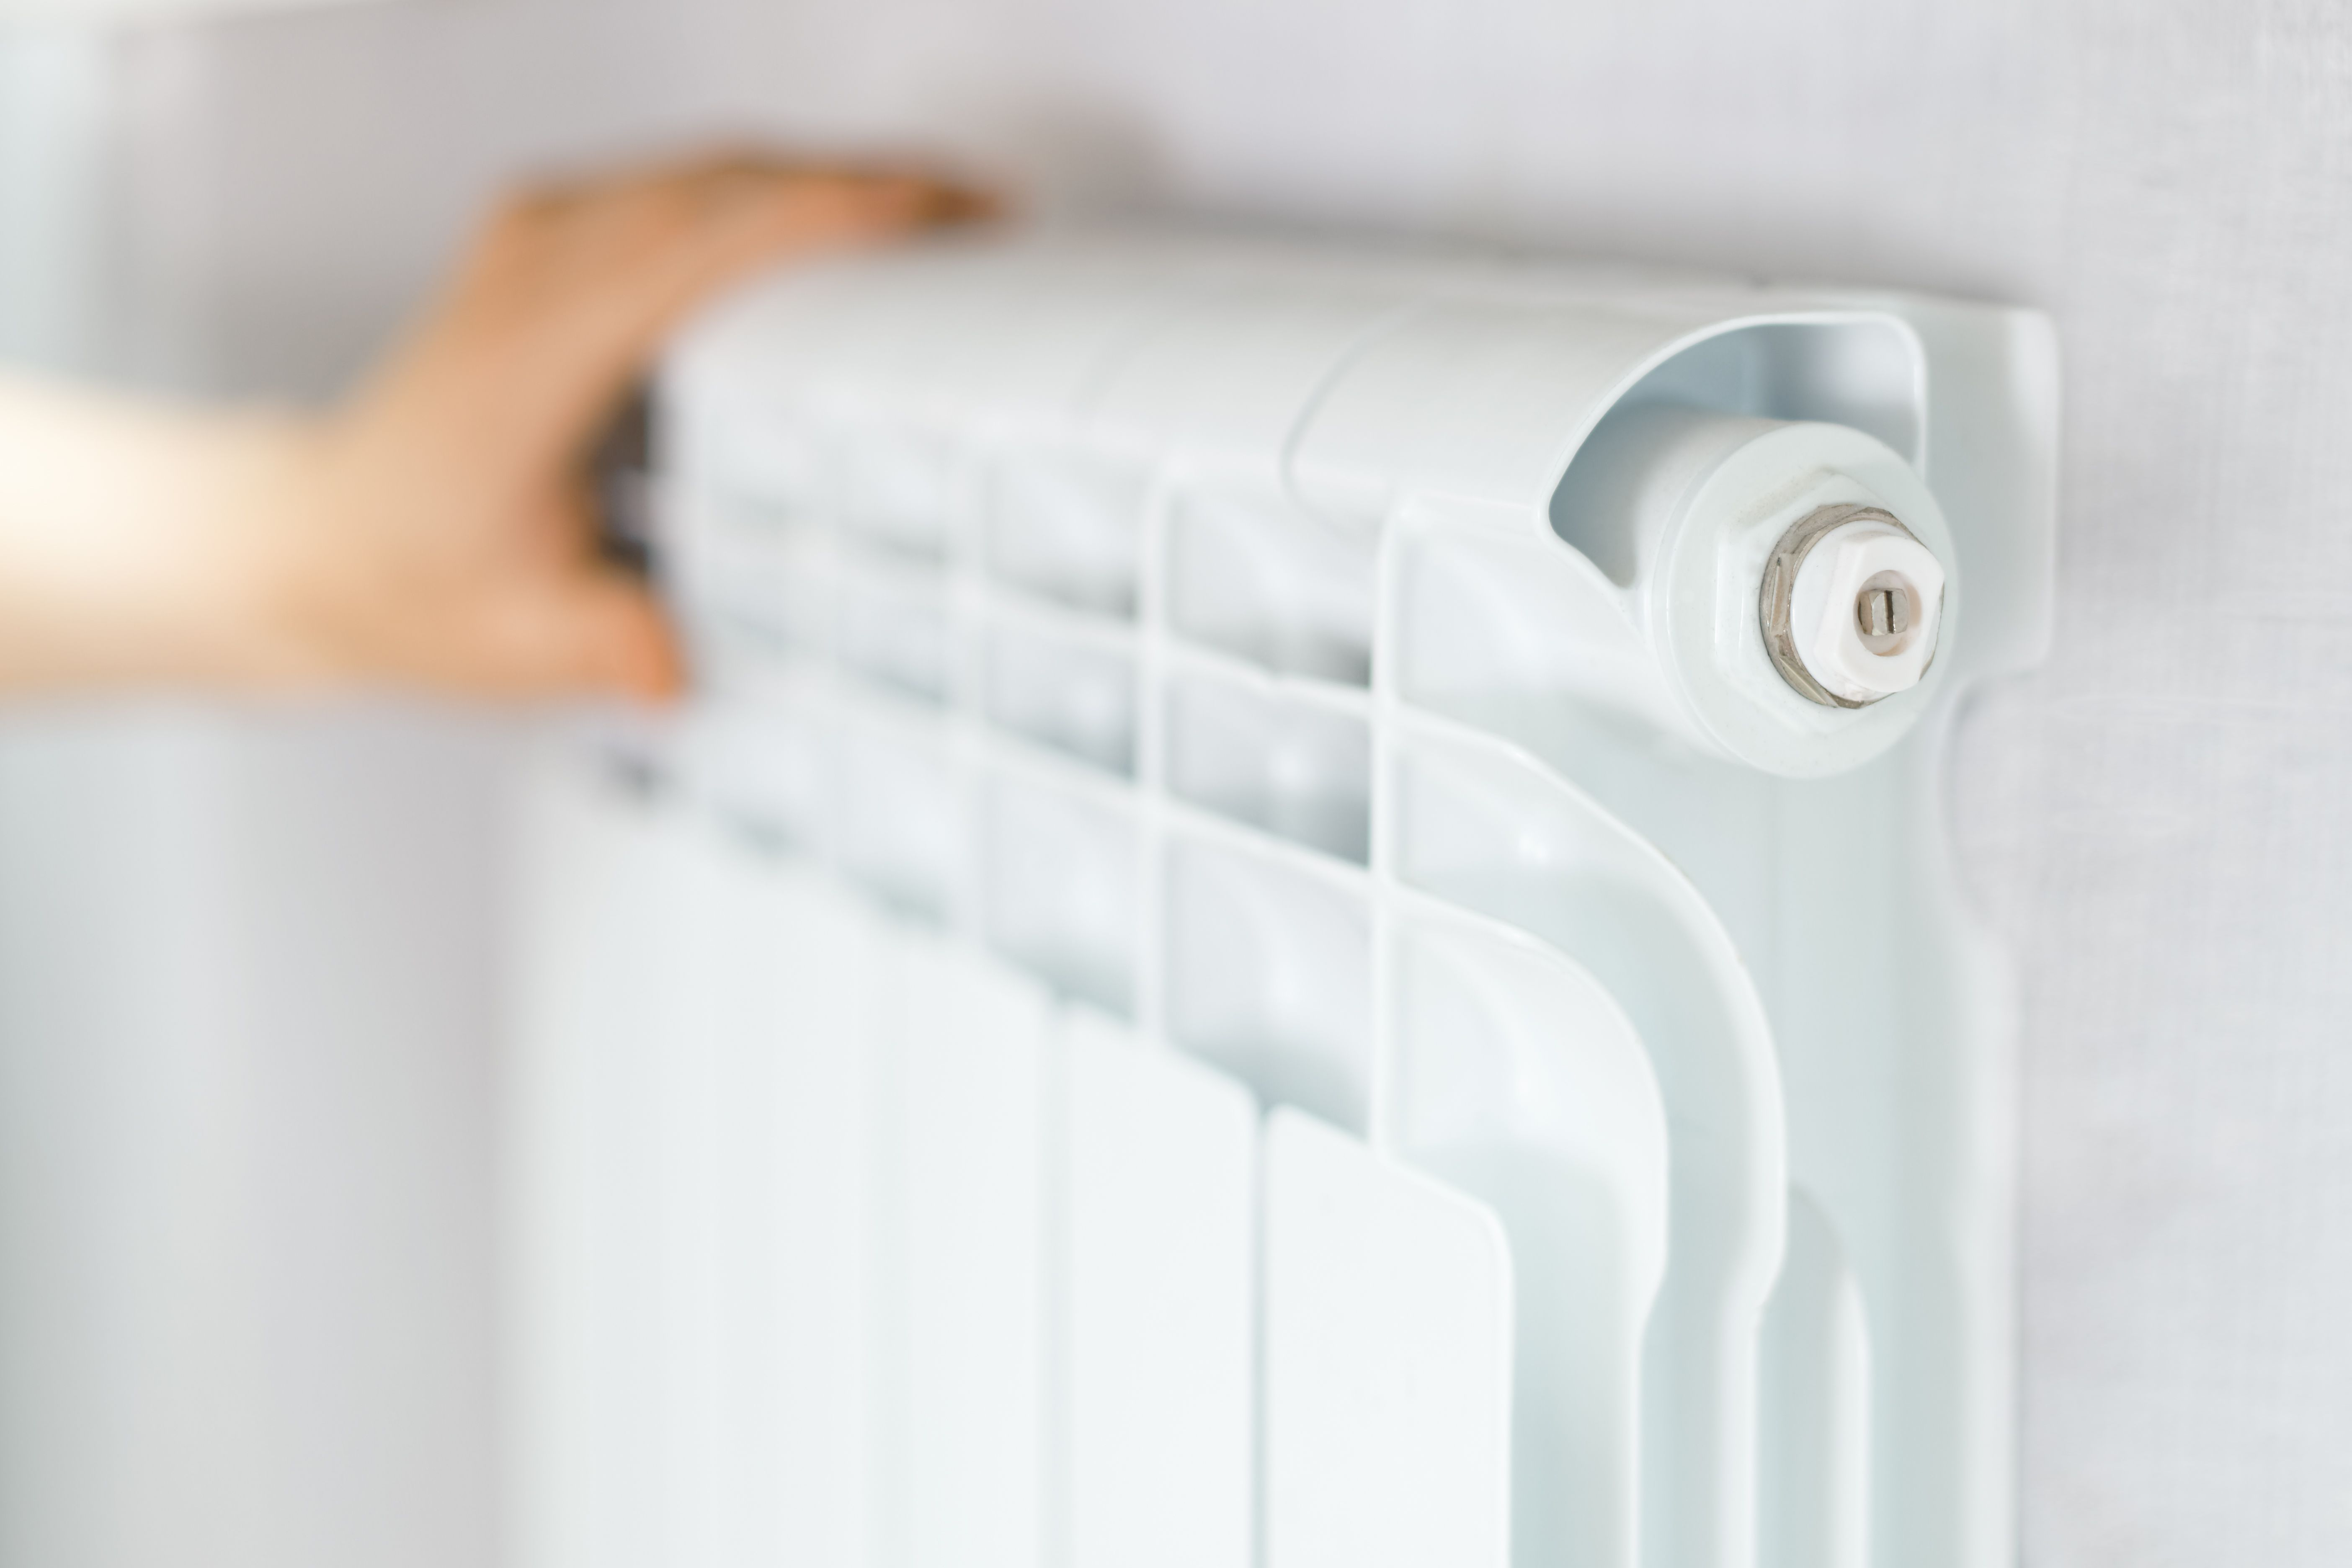 Instalación de radiadores en Zaragoza